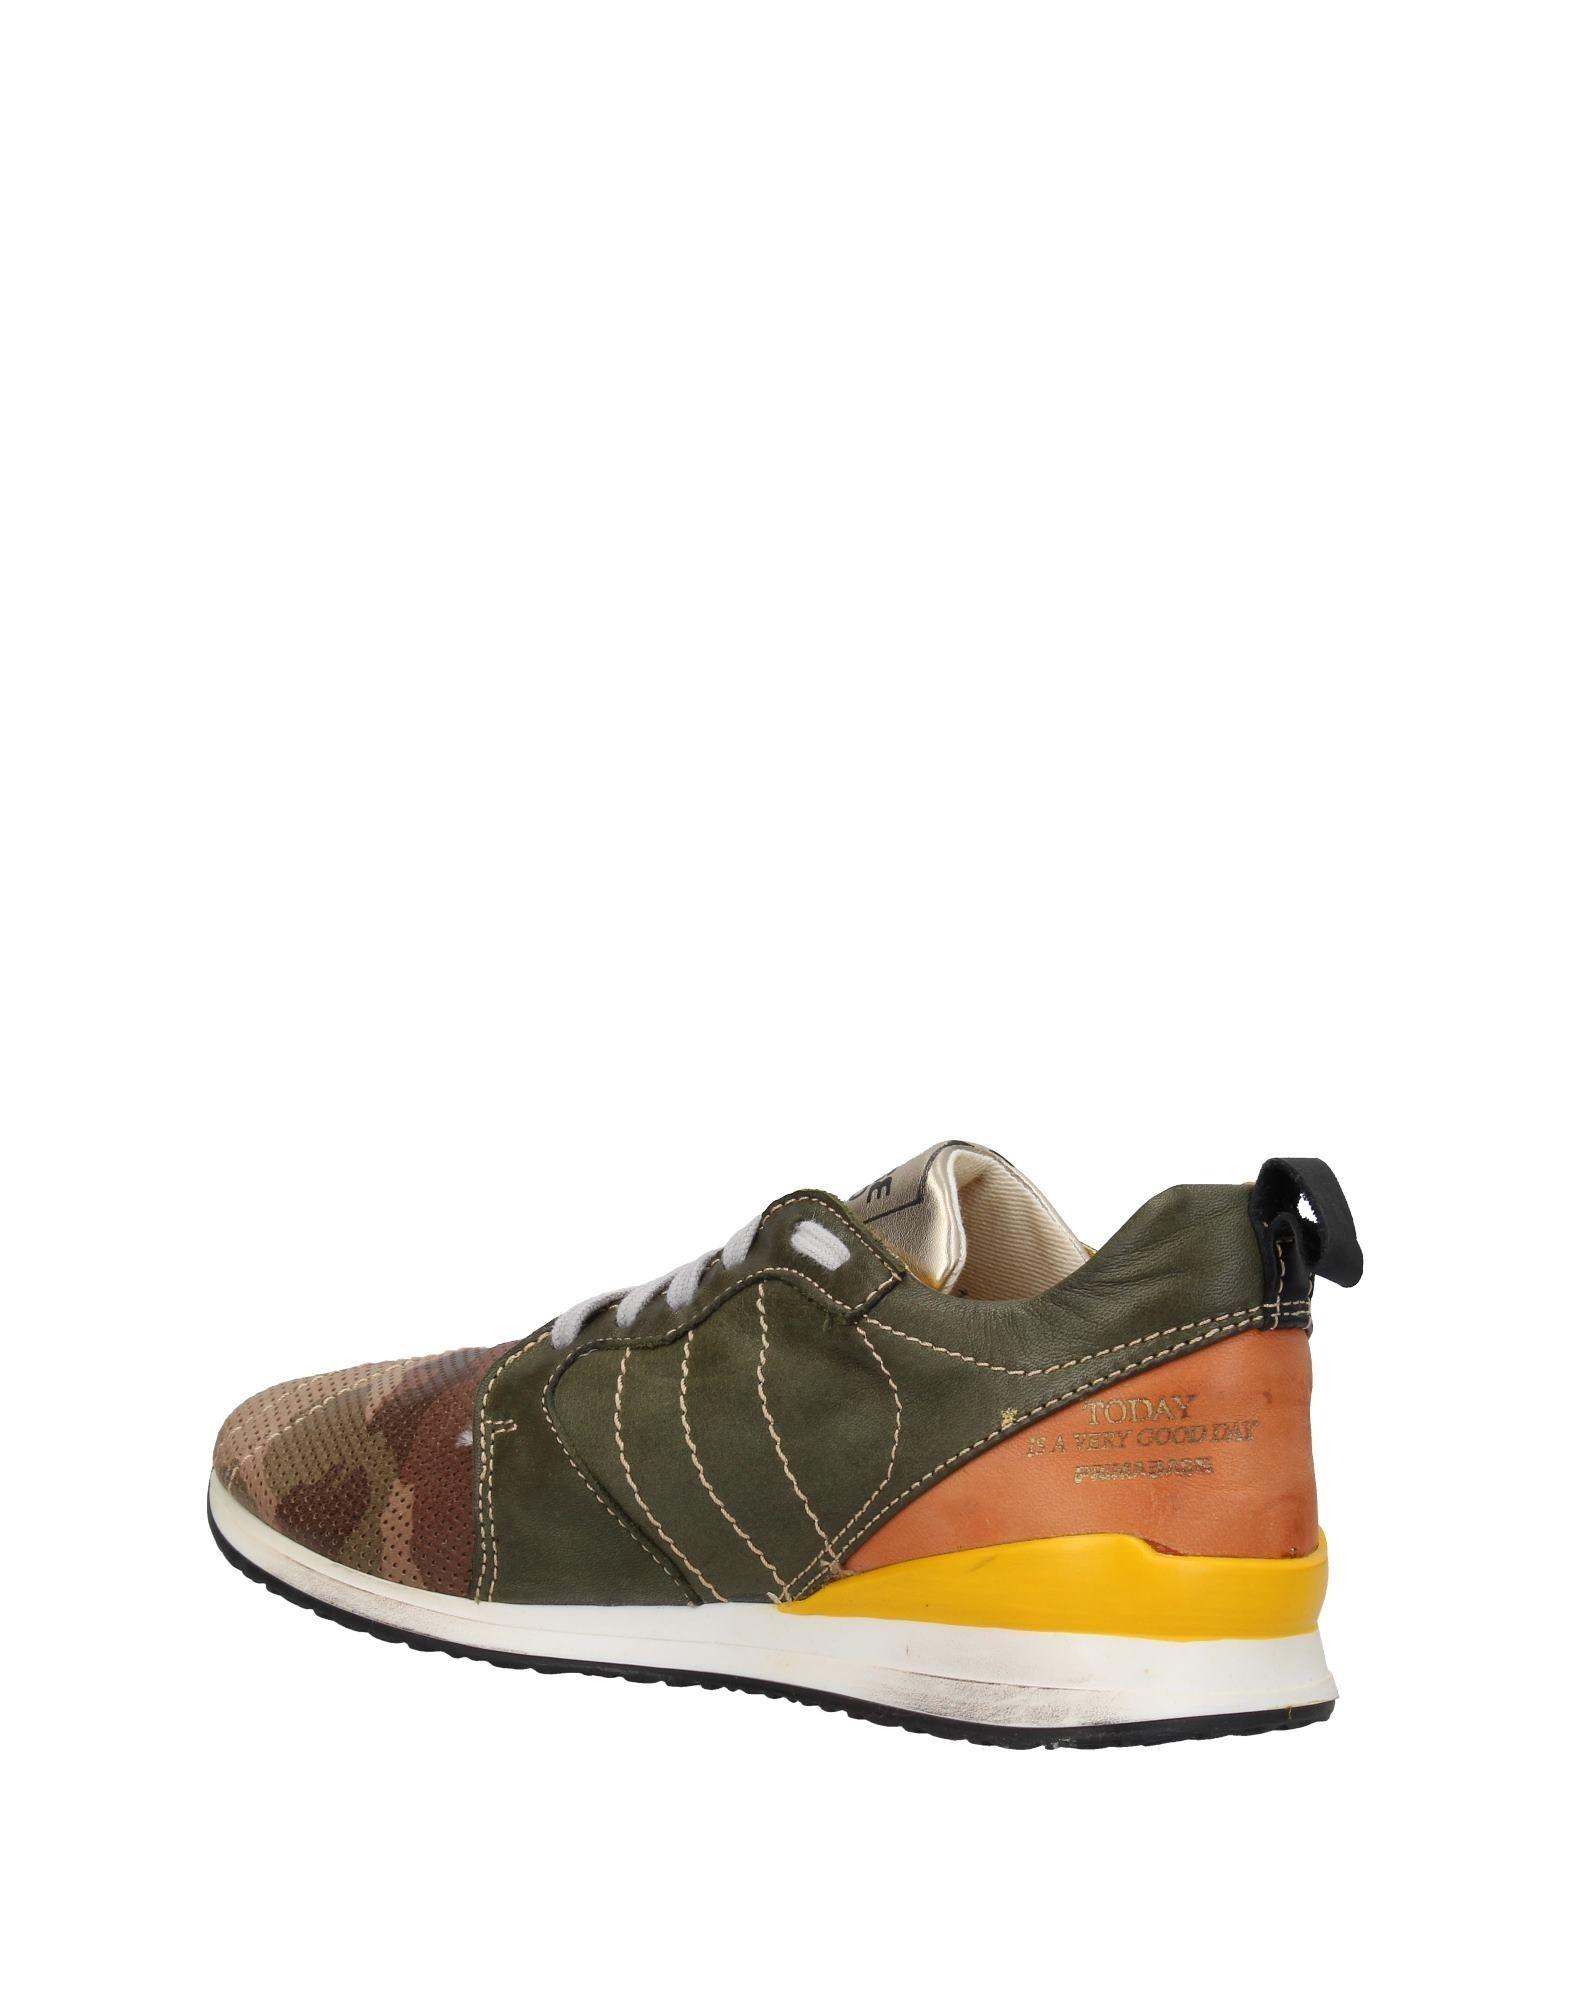 Scarpe economiche economiche economiche e resistenti Sneakers Primabase Uomo - 11374029GP 44ffb1